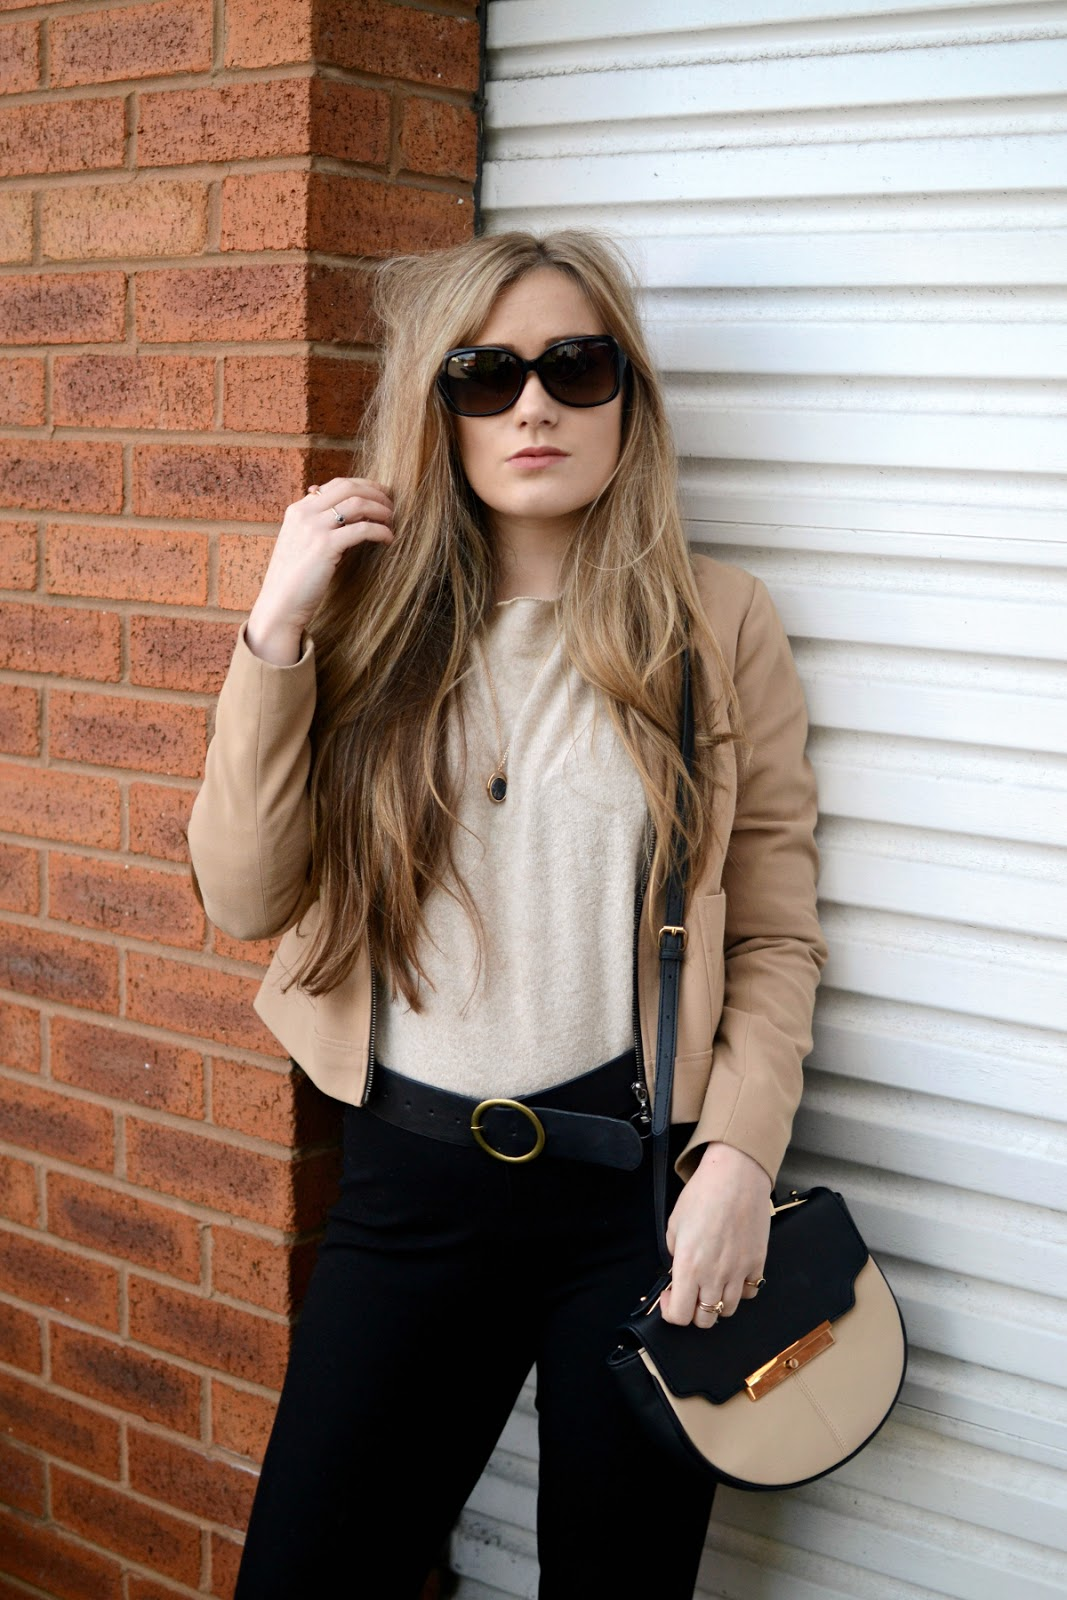 discounted-sunglasses-premium-polaroid-X8404-sunglasses-review-5